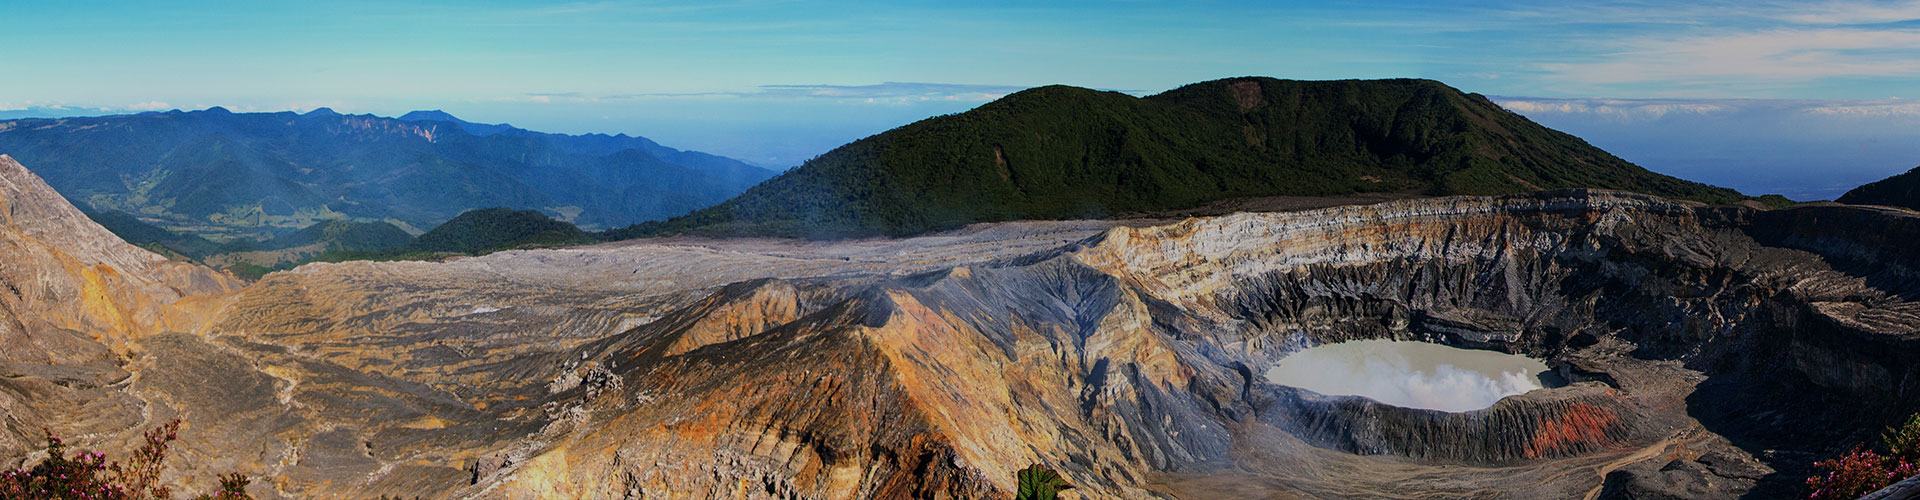 Landmark photograph of Costa Rica